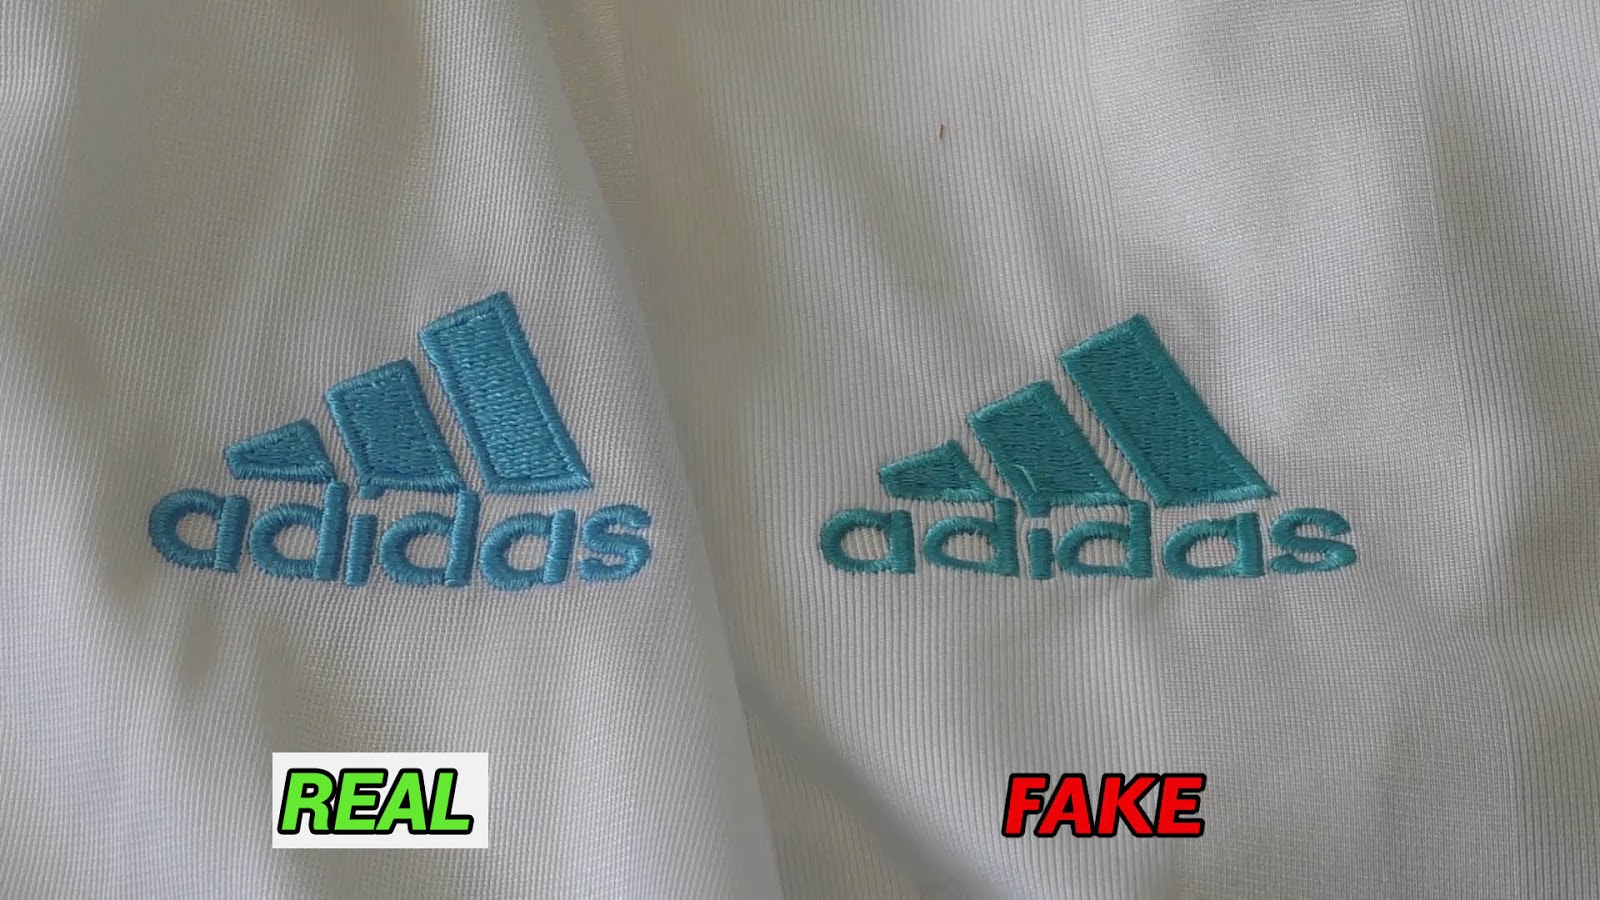 96165ff01 Lacoste Polo Shirt Original Vs Fake – EDGE Engineering and ...